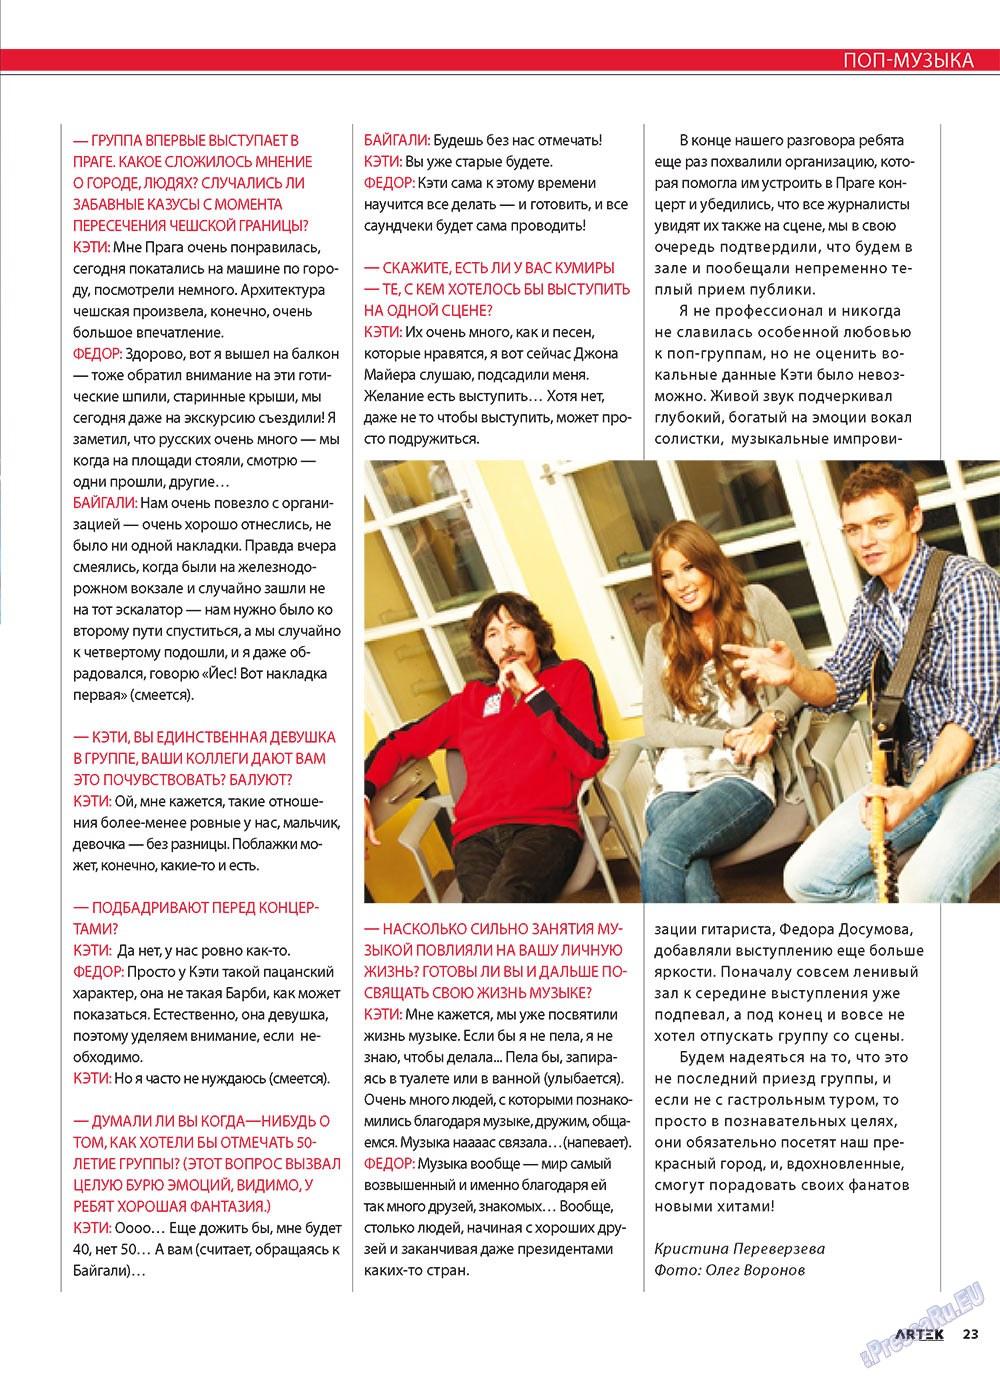 Артек (журнал). 2010 год, номер 5, стр. 25